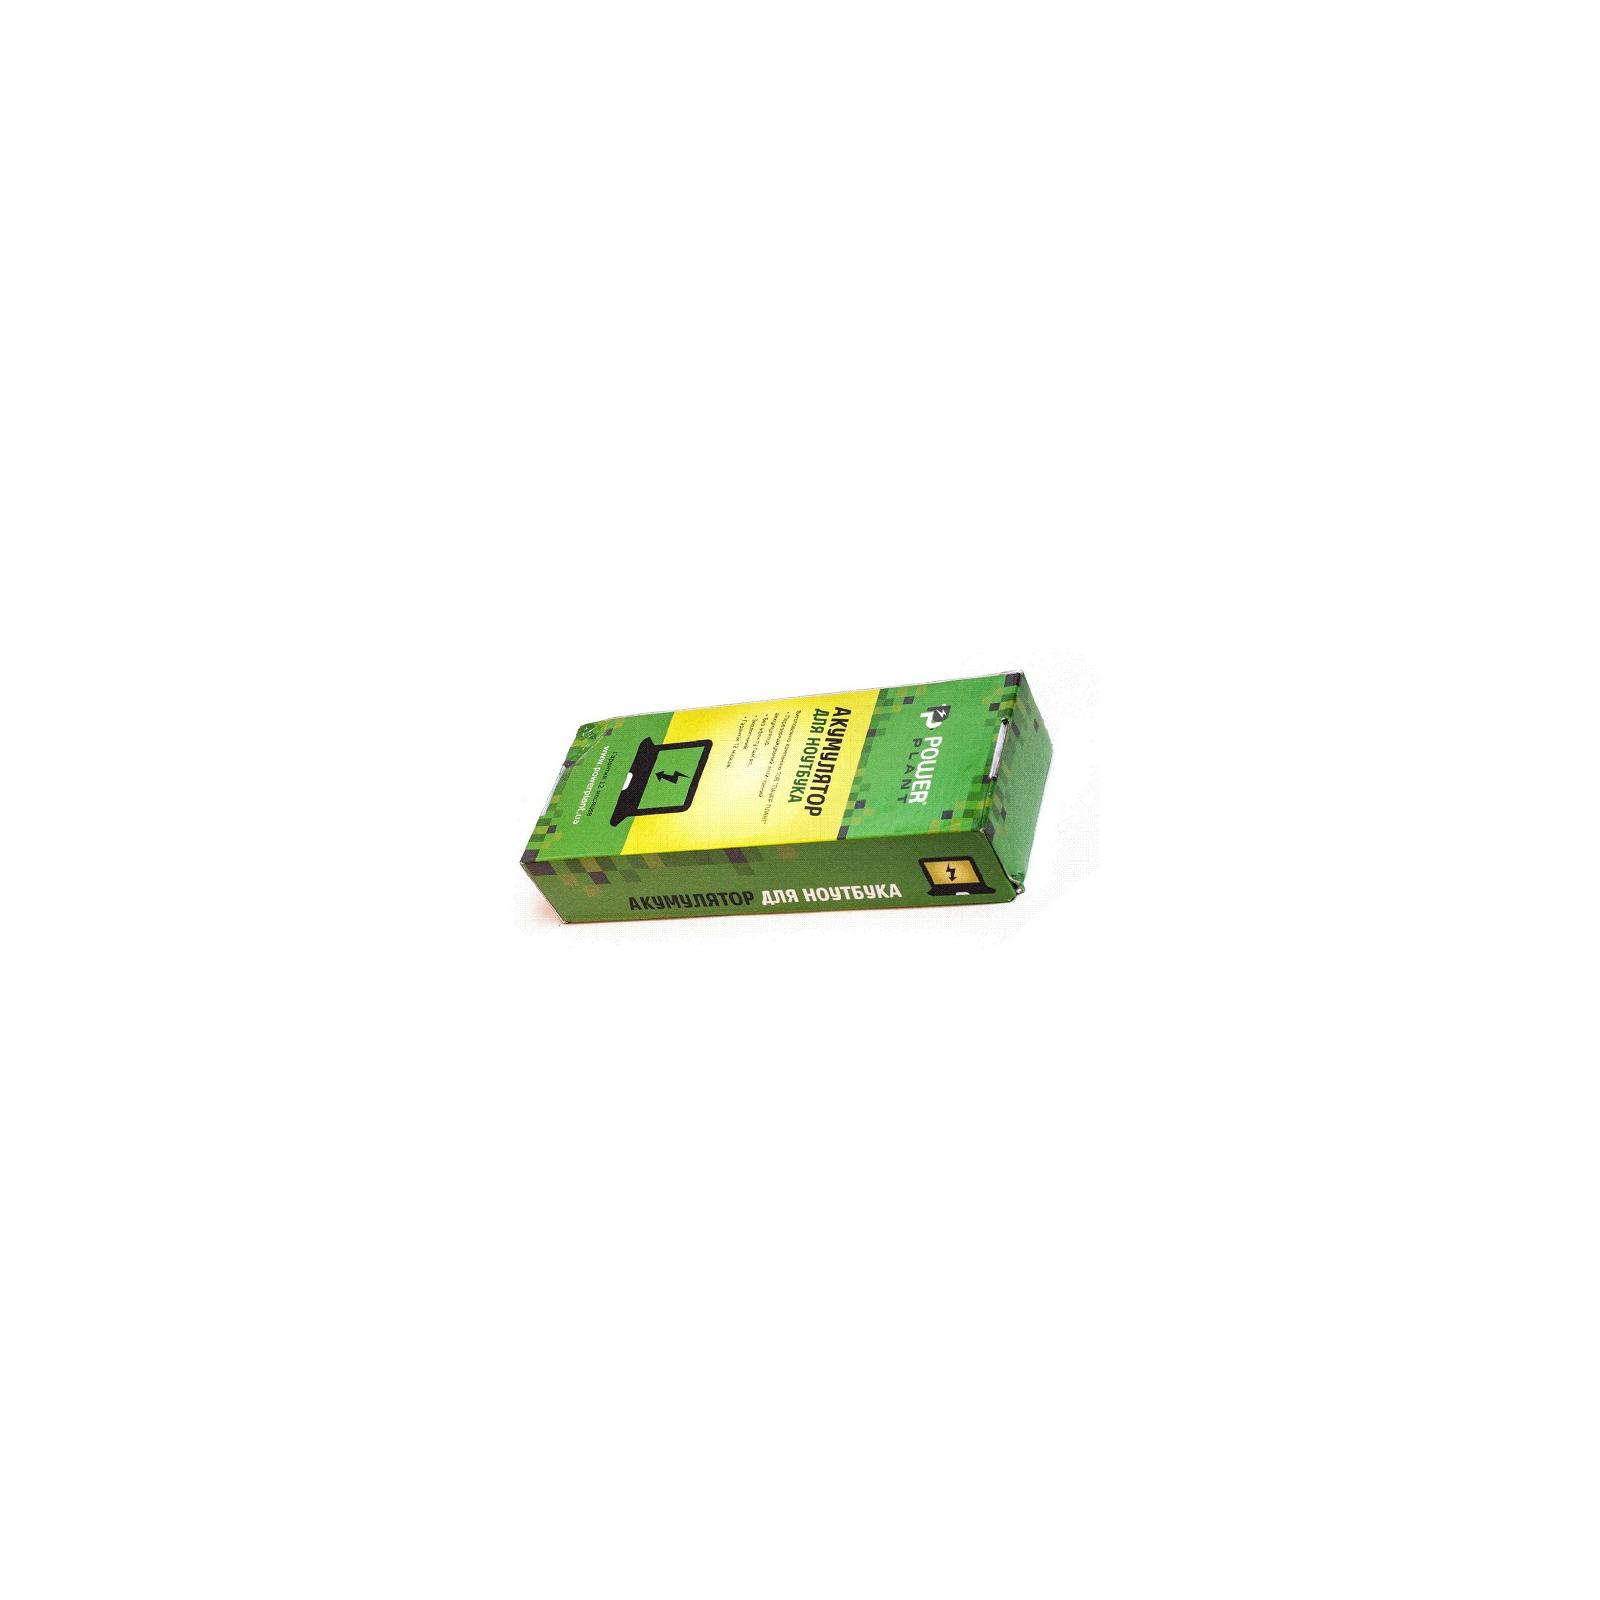 Аккумулятор для ноутбука LENOVO IdeaPad G460 (L09L6Y02 ,LOG460LH) 10.8V 4400mAh PowerPlant (NB00000291) изображение 3